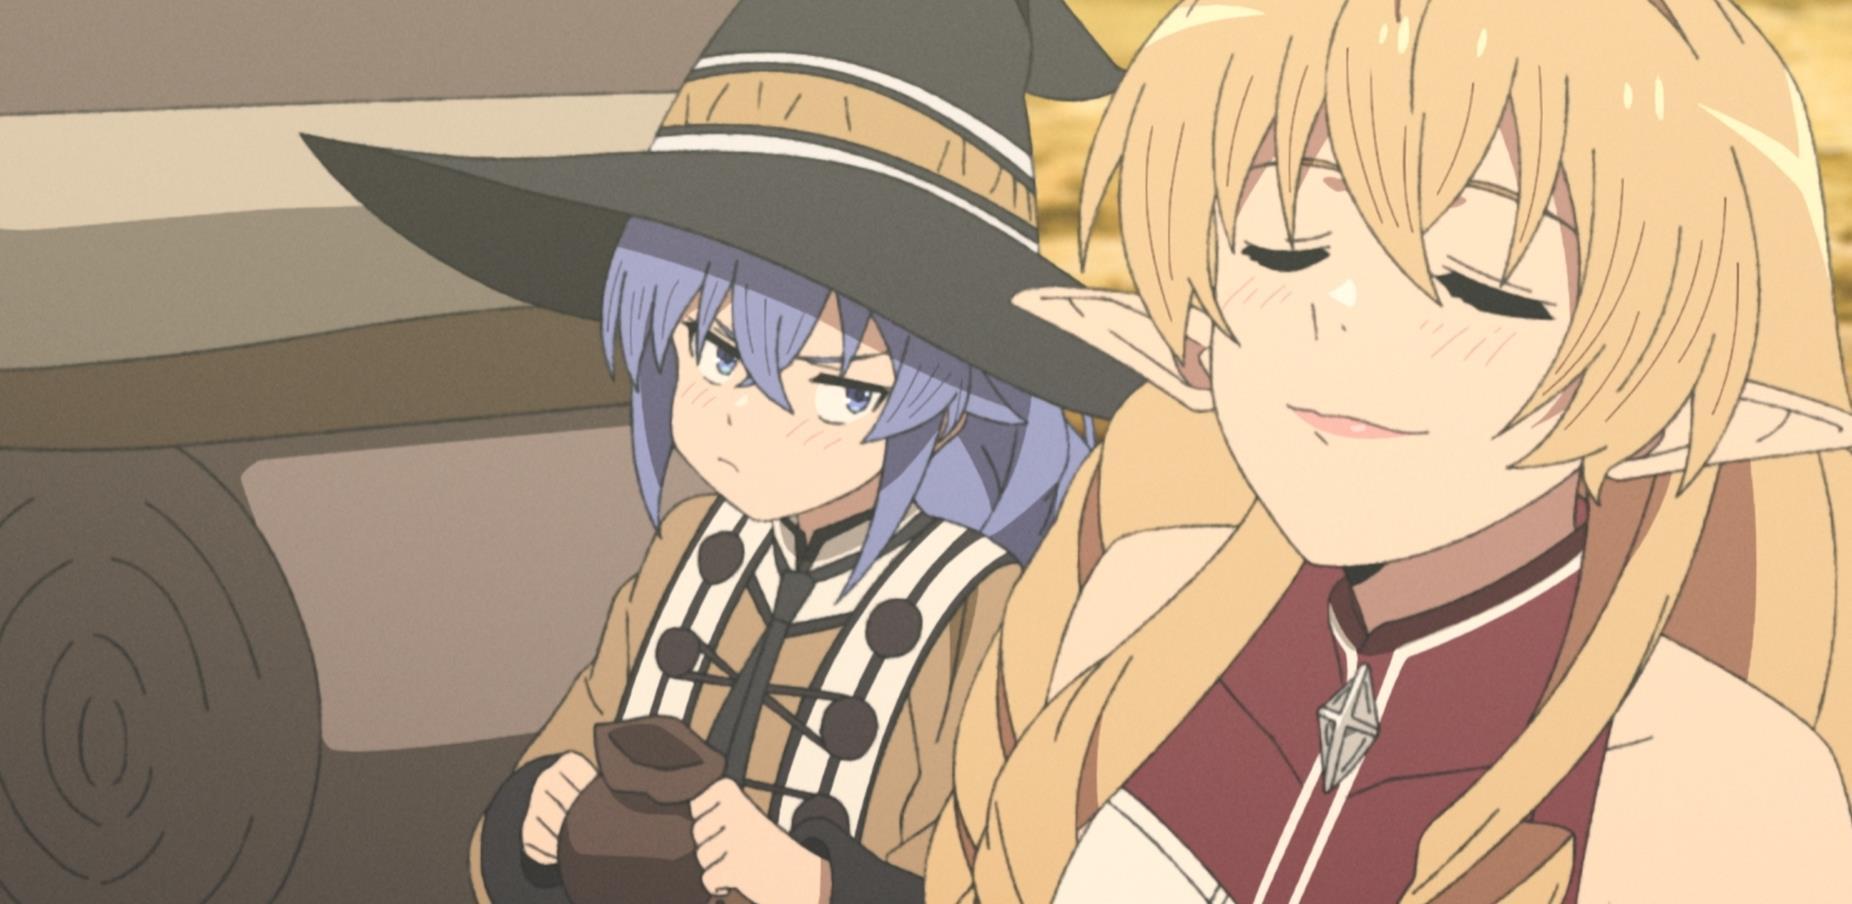 Mushoku Tensei Episode 14 Spoiler Zusammenfassung Erscheinungsdatum b049Tb5Ro 1 1